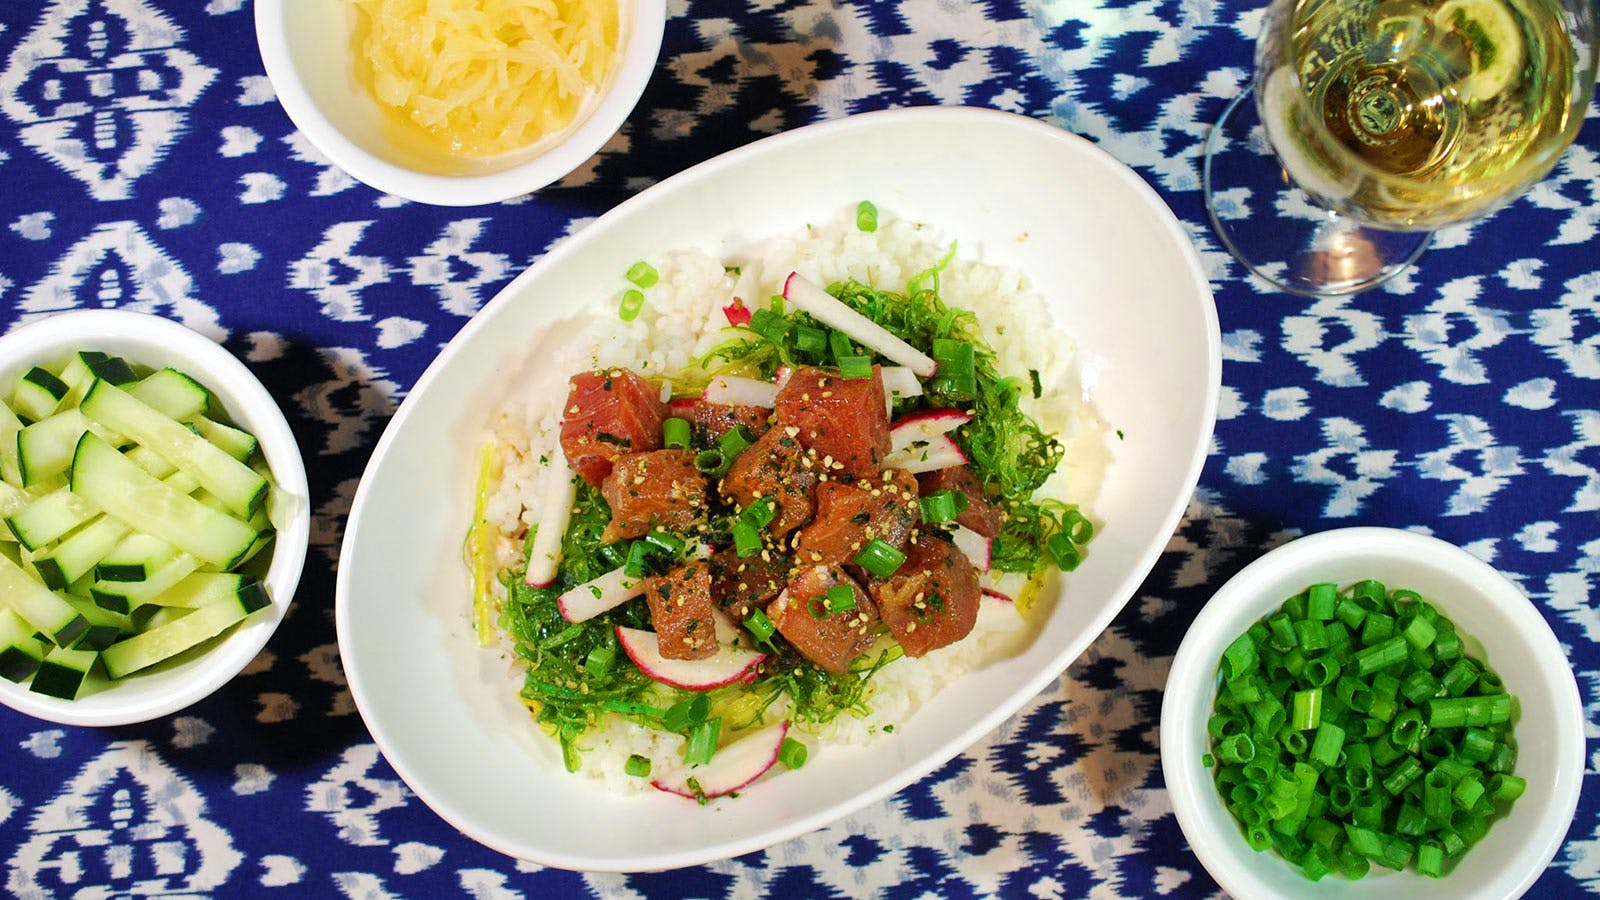 8 & $20: Spicy Tuna Poke Bowl